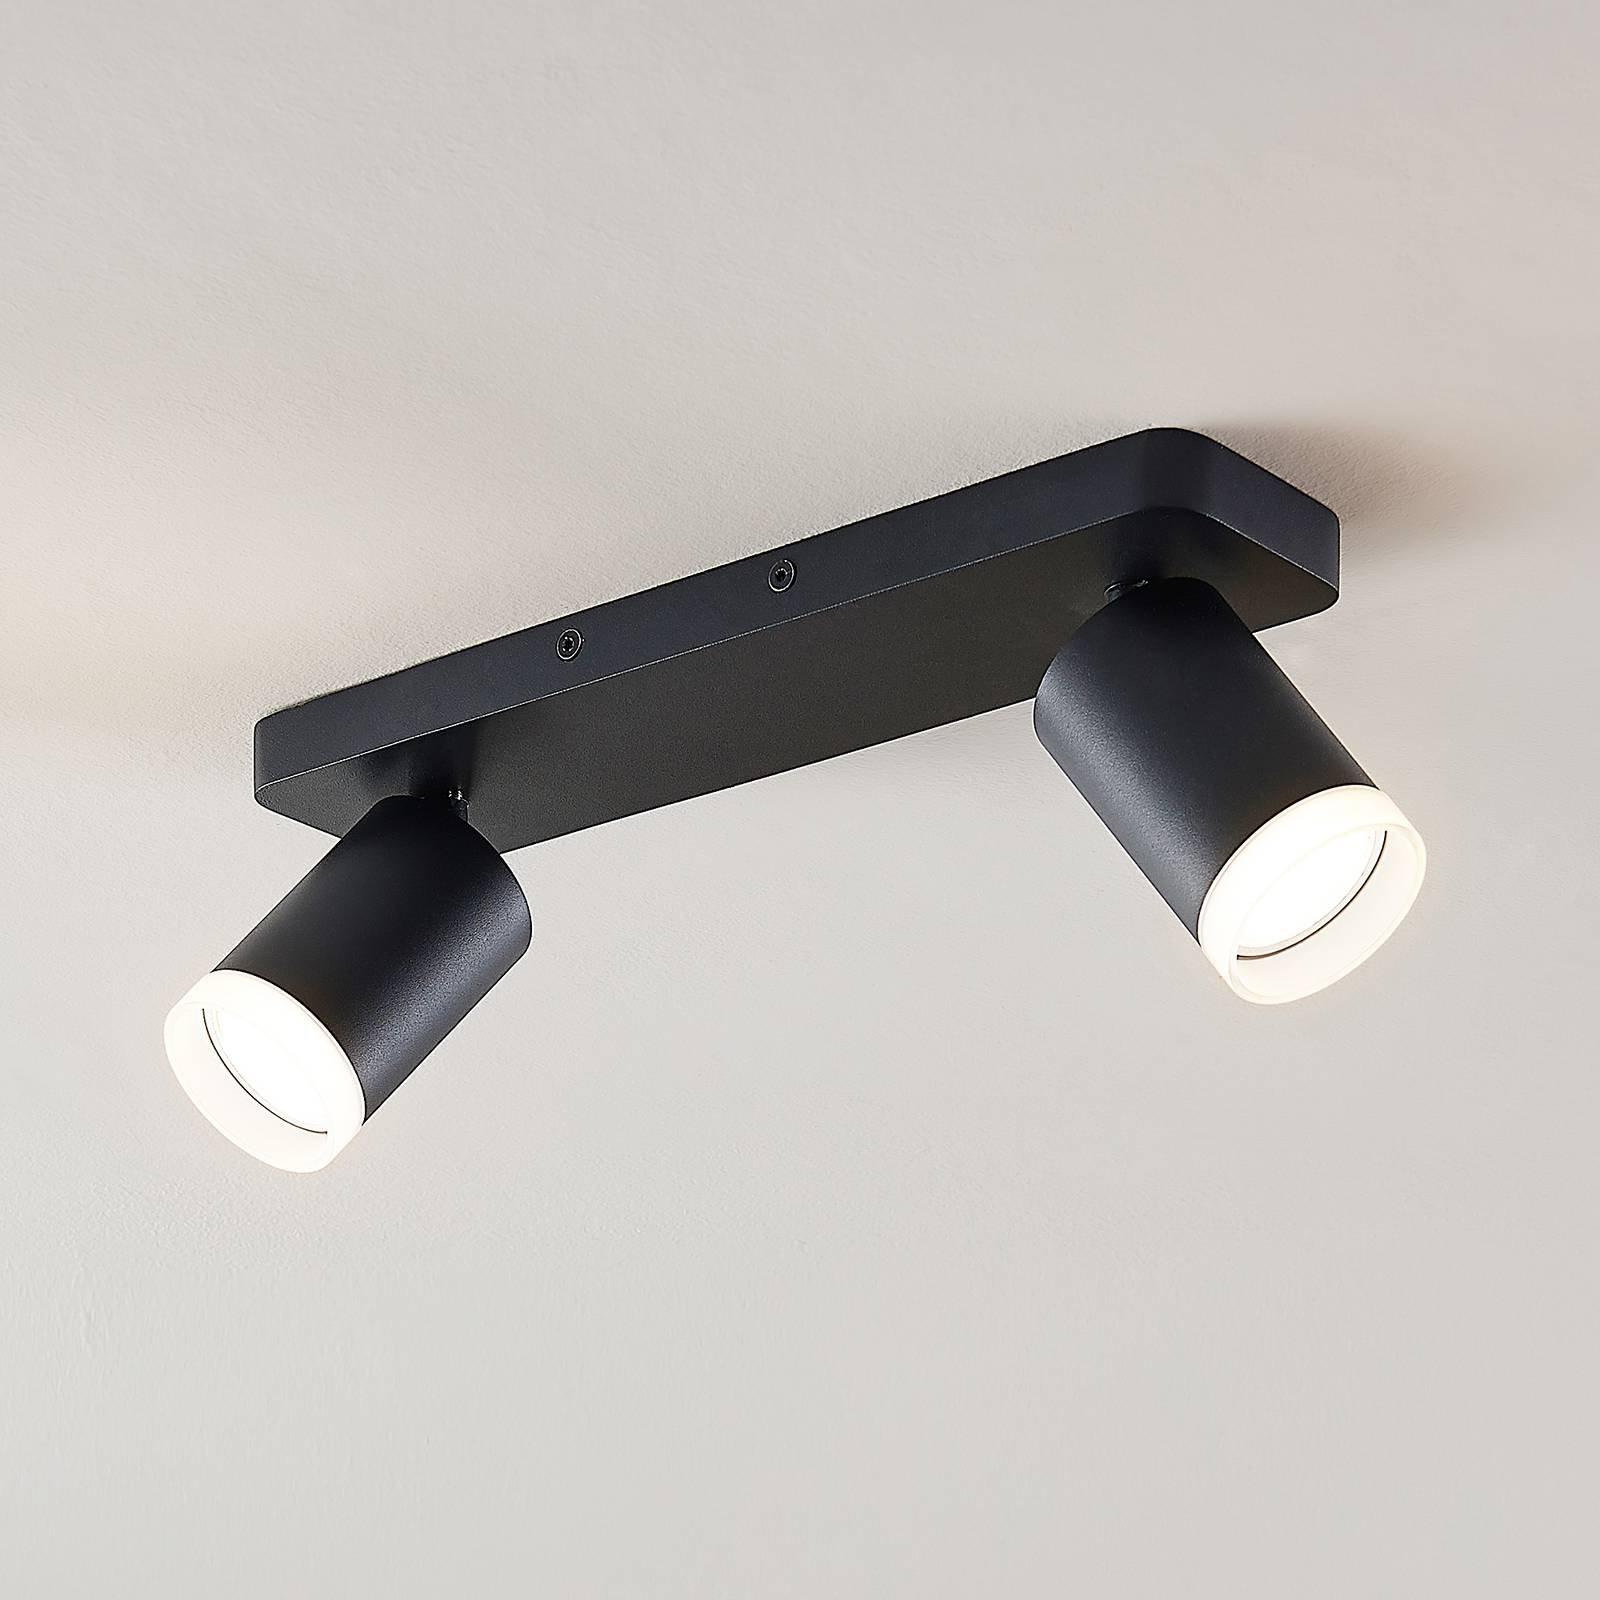 Arcchio Efilius takspot, svart, 2 lyskilder